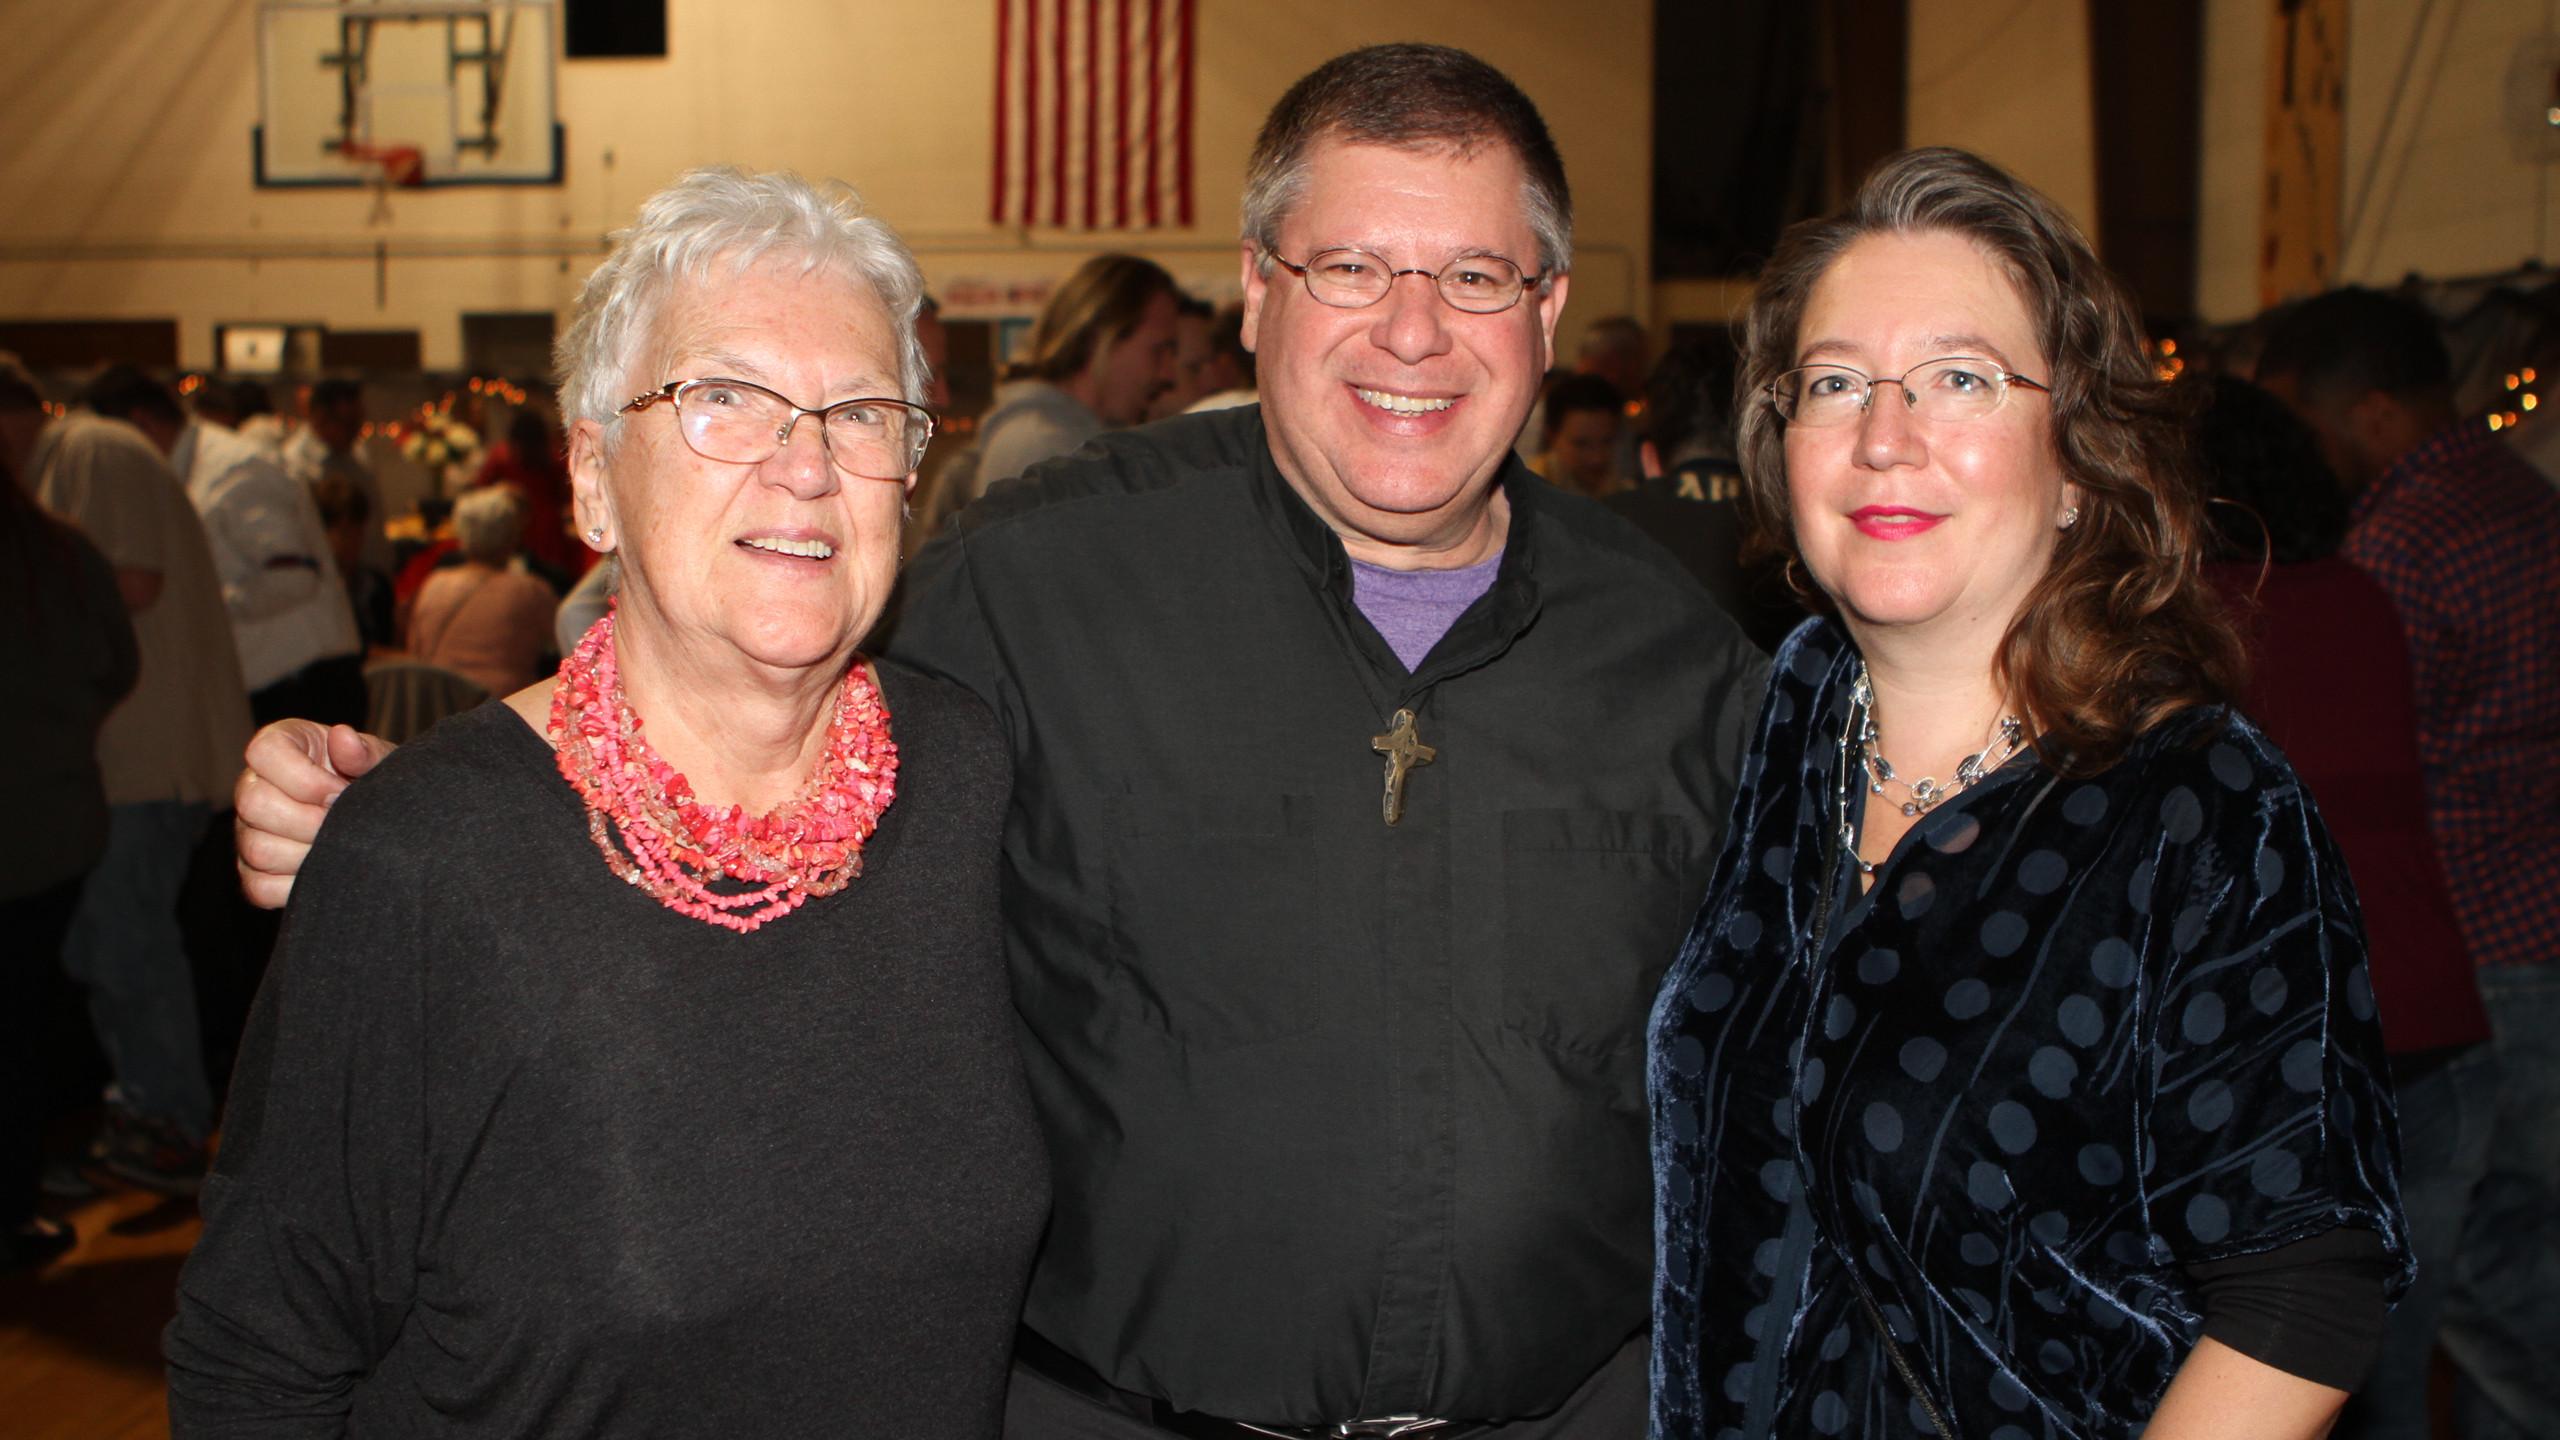 Renate Platz, Father Steve Wolf and Astr